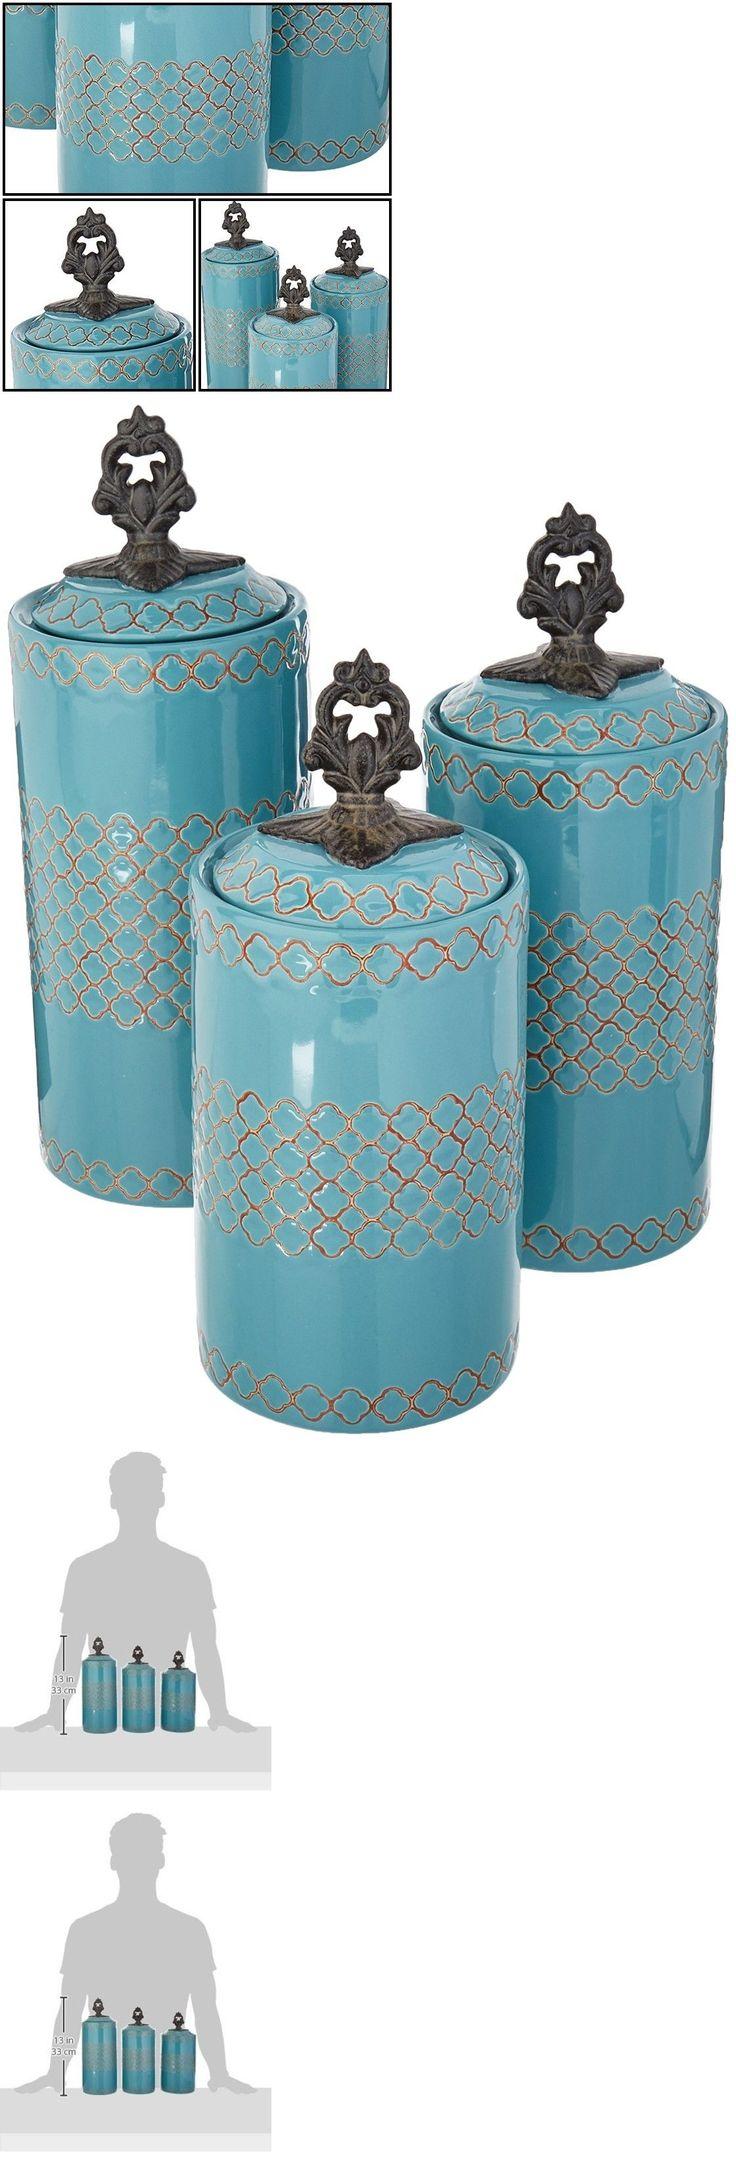 mas de 25 ideas increibles sobre ceramic canister set en pinterest canisters and jars 20654 ceramic canisters set of 3 blue coffee milk bones jar bin